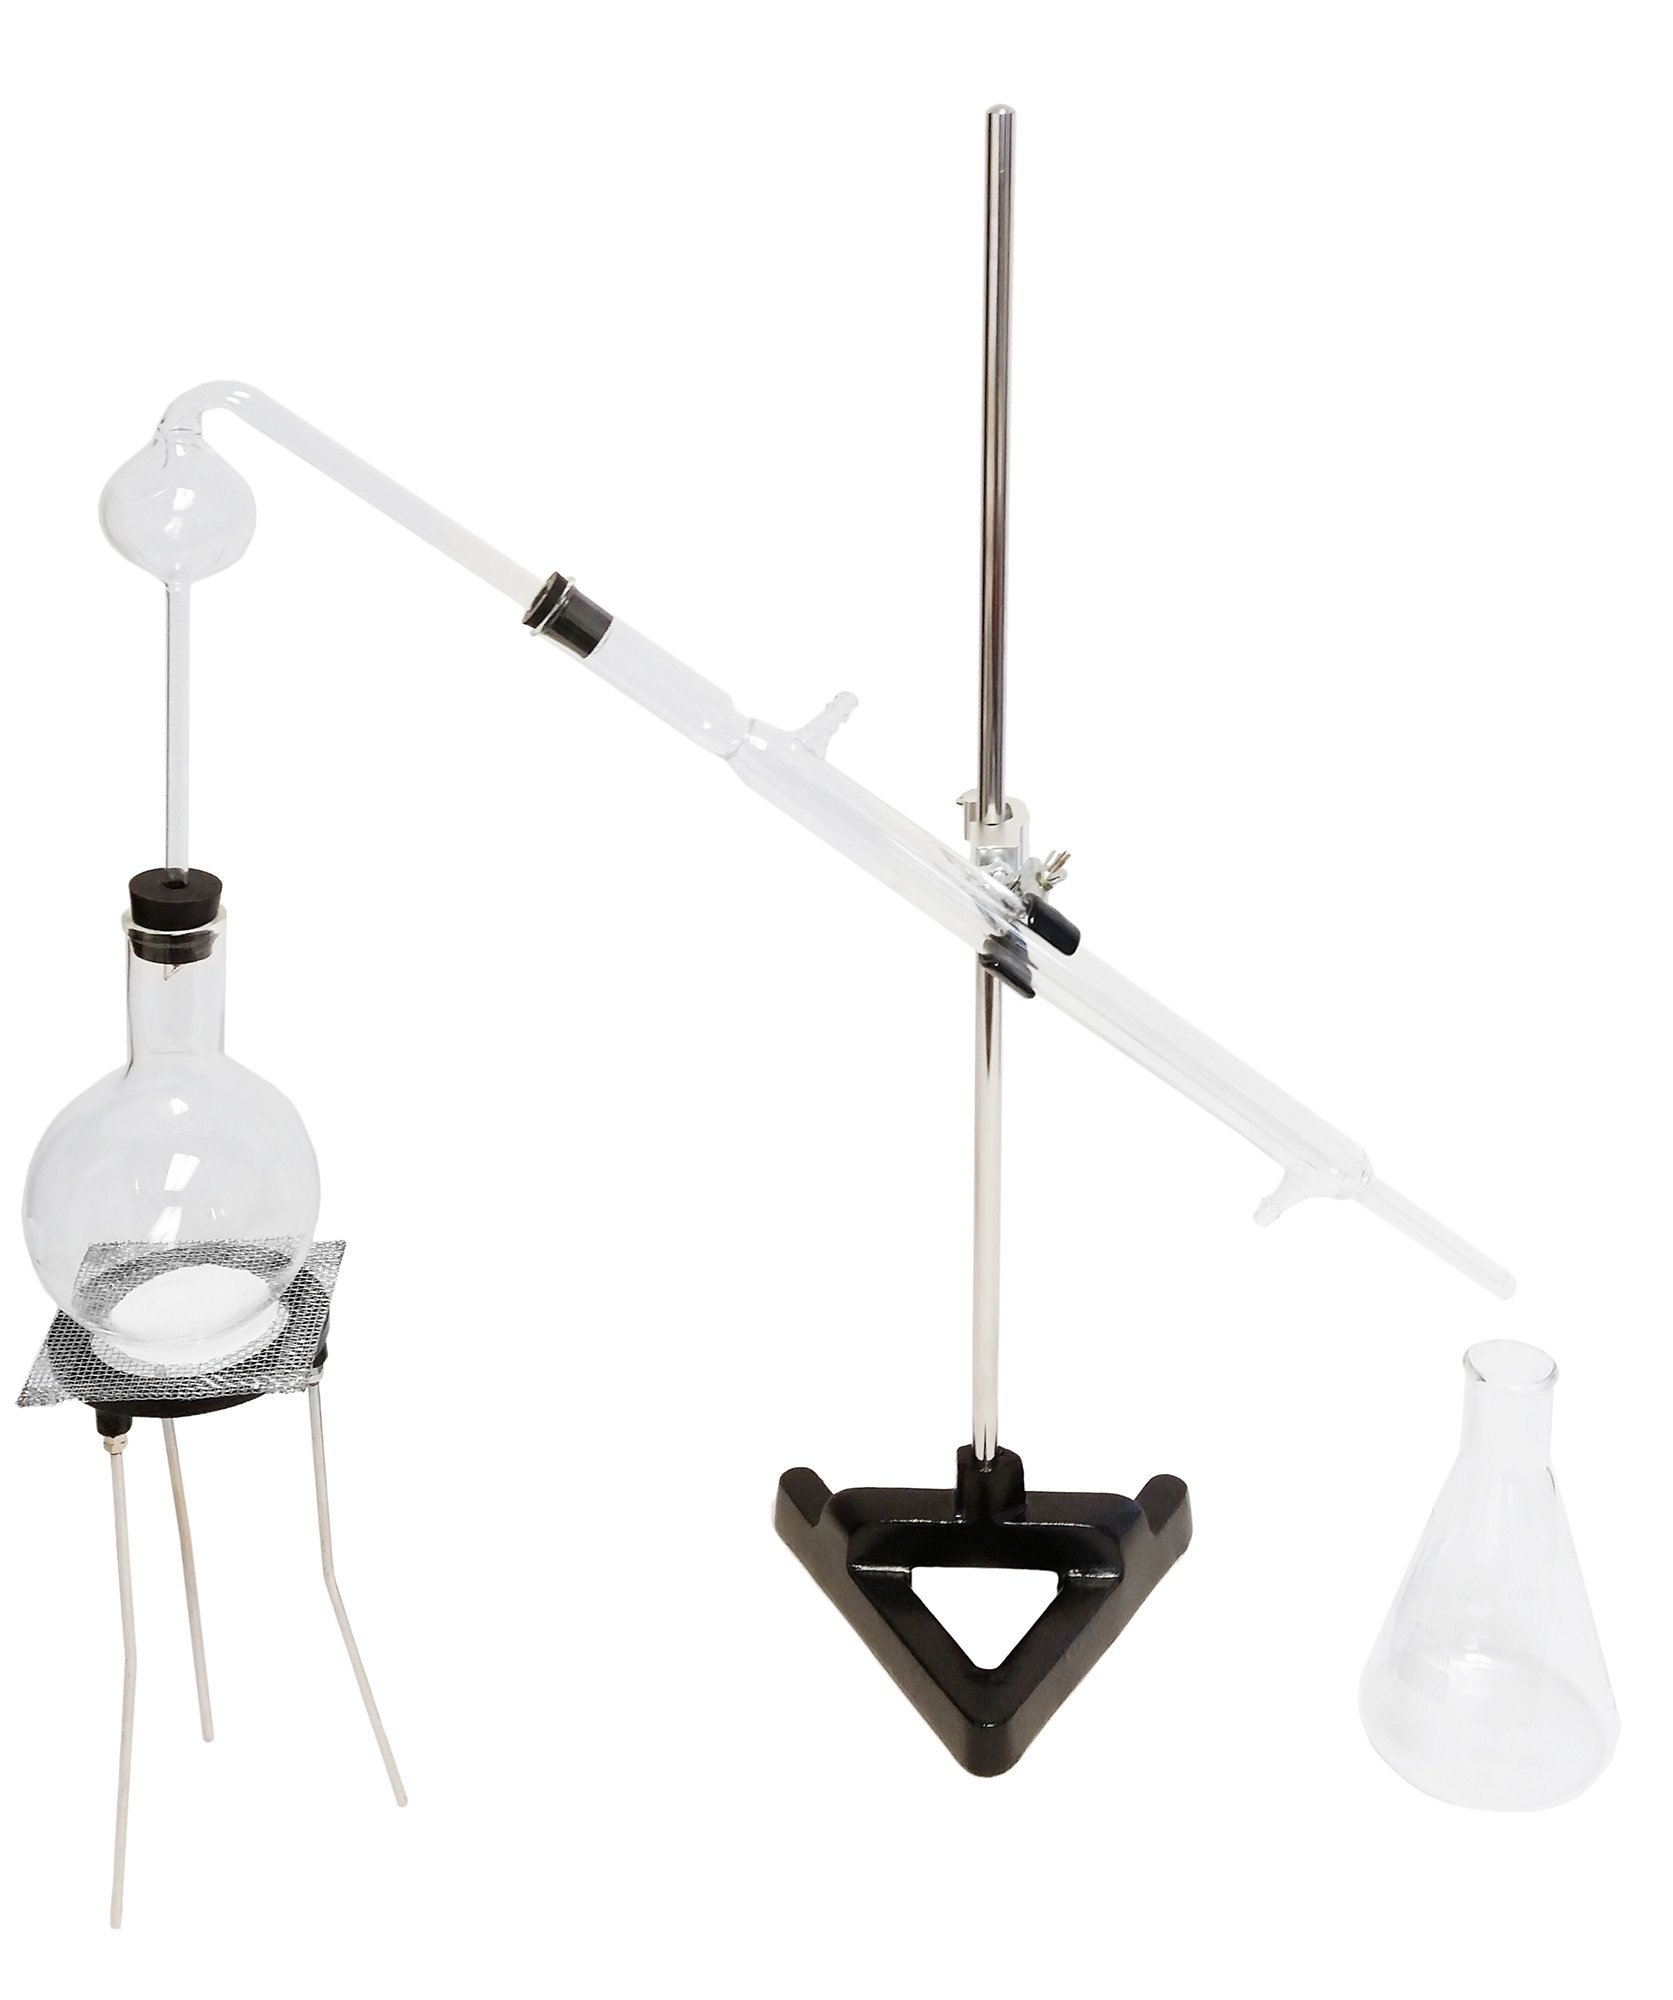 GSC International 4002 Distillation Apparatus for Student Kit, 50mm Diameter